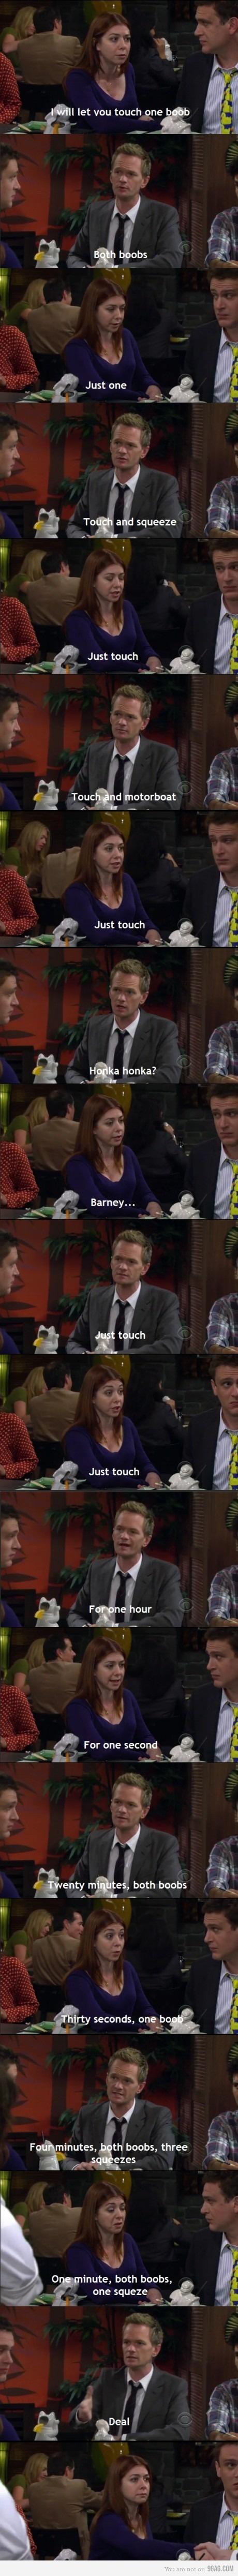 Making business LVL: Barney Stinson